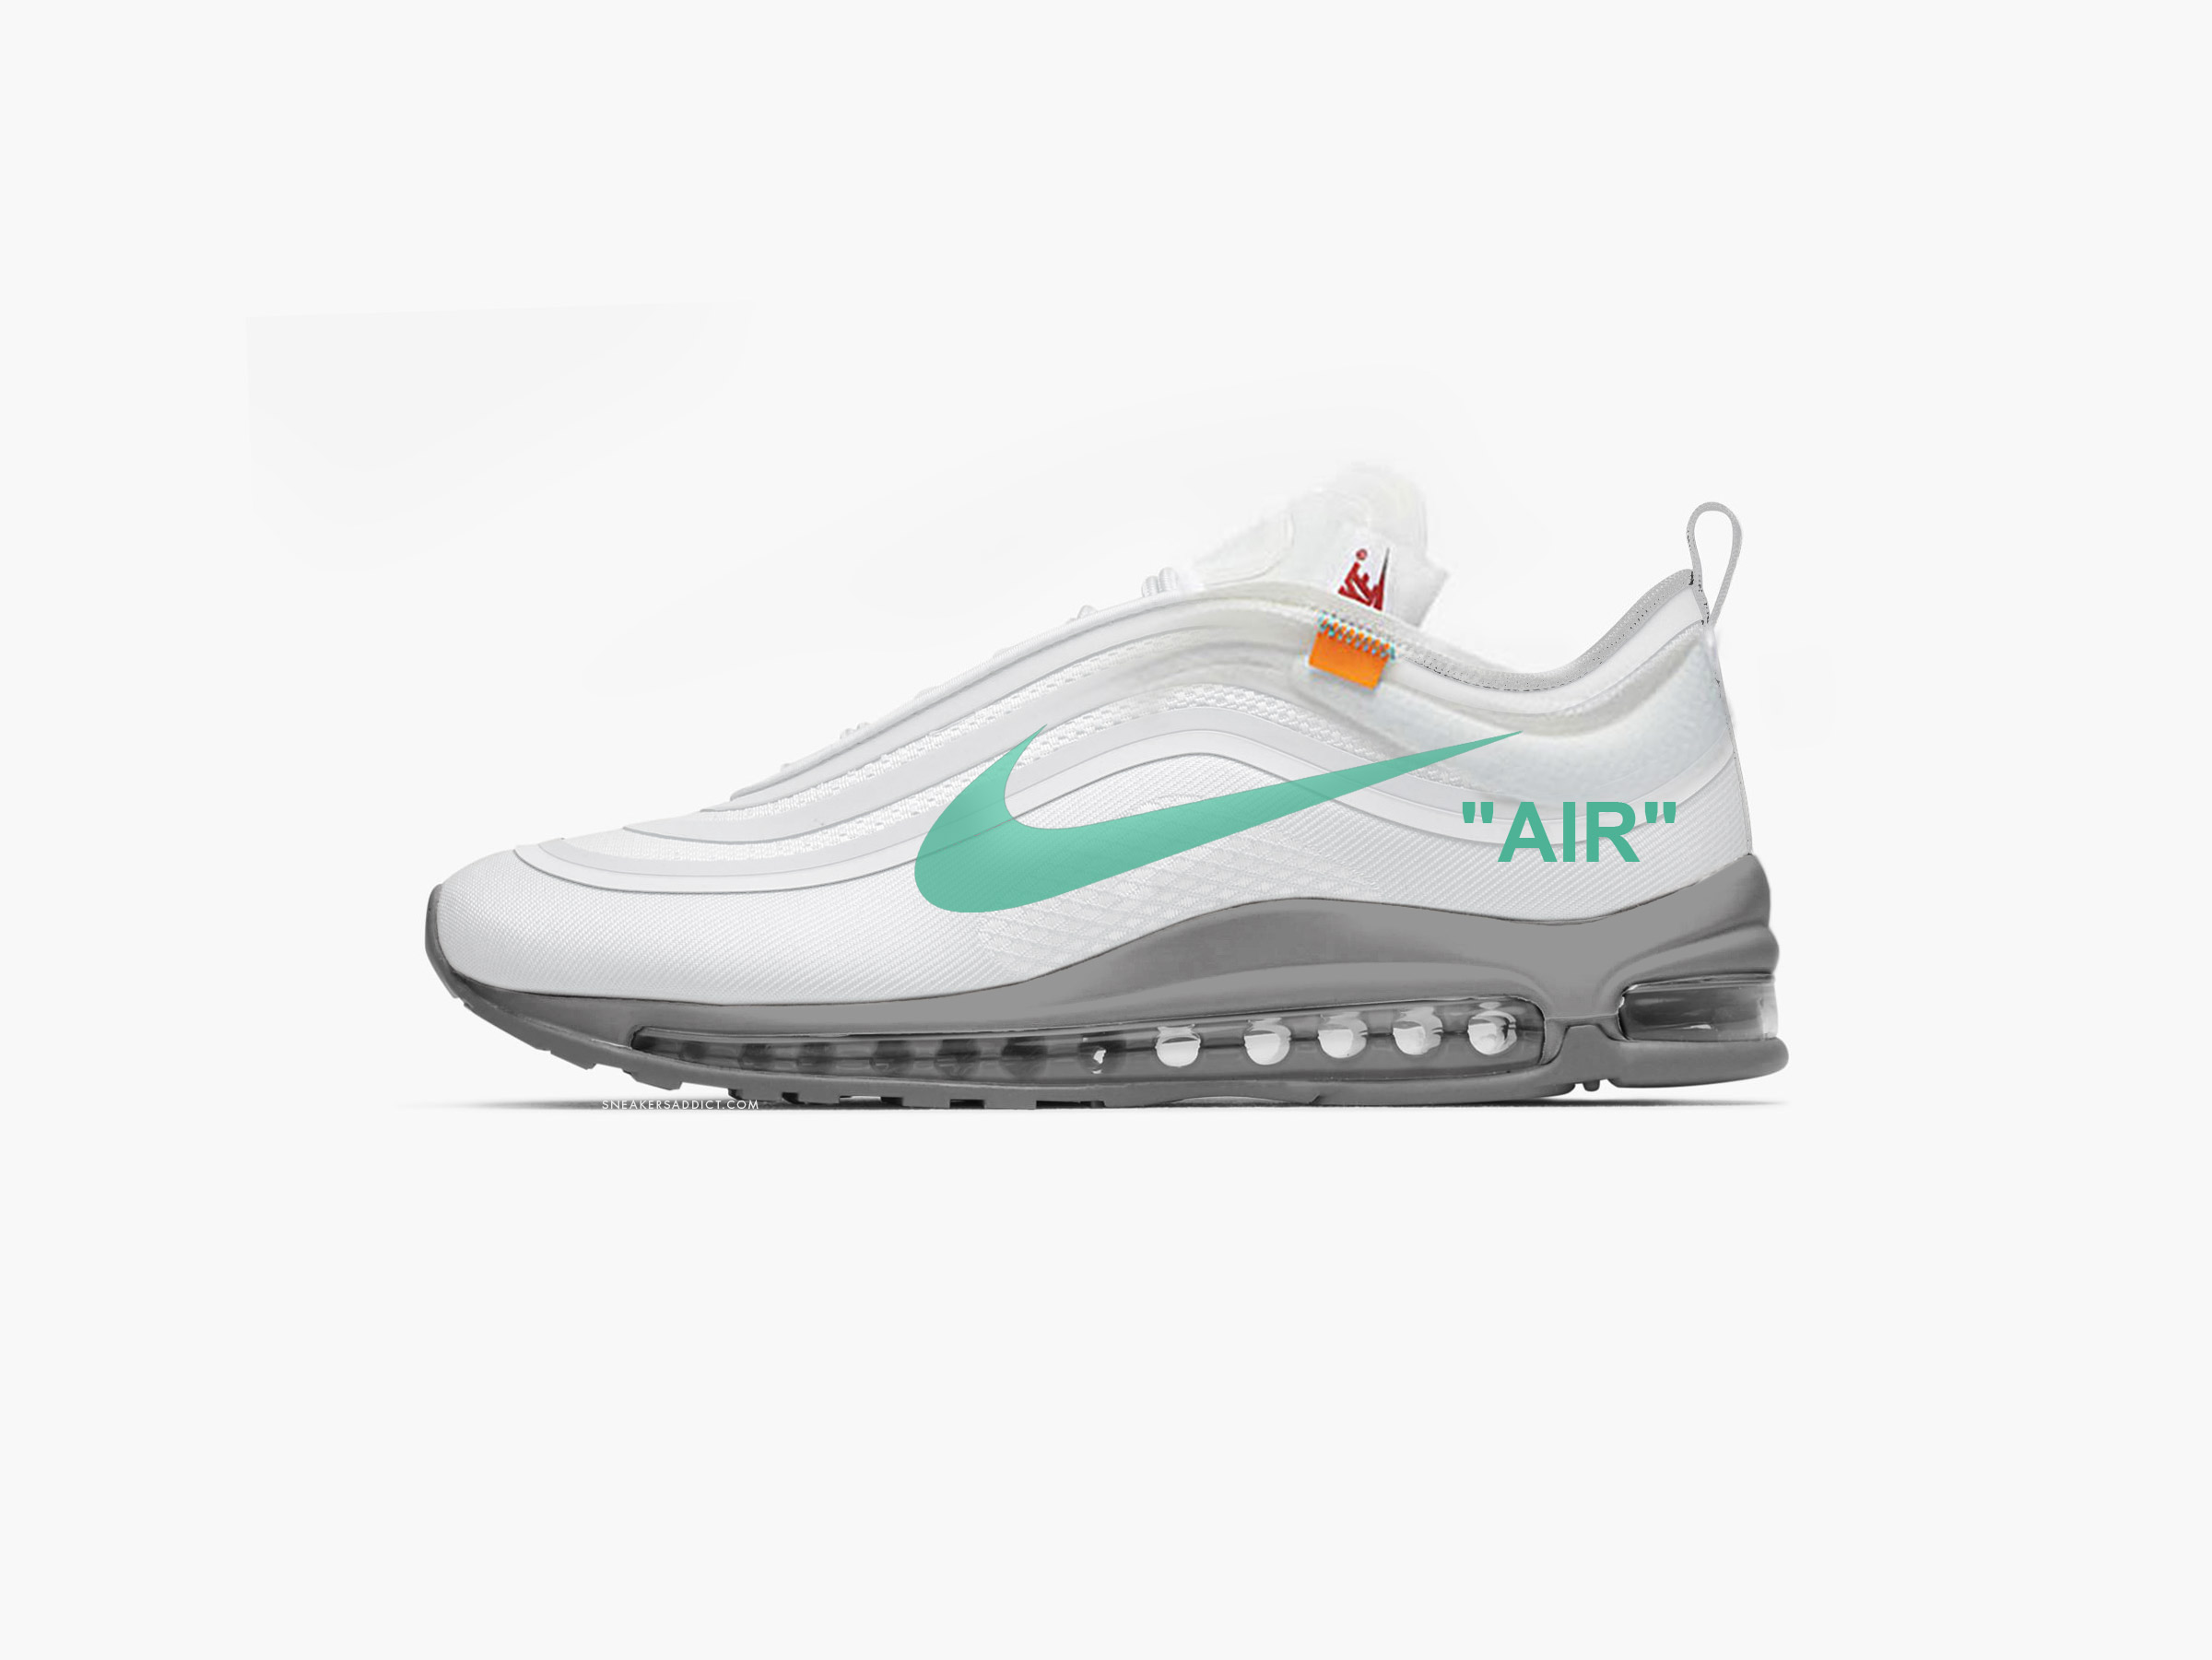 aa242ca40e Off White X Nike Air Max 97 Menta December 8 | white x nike air max ...